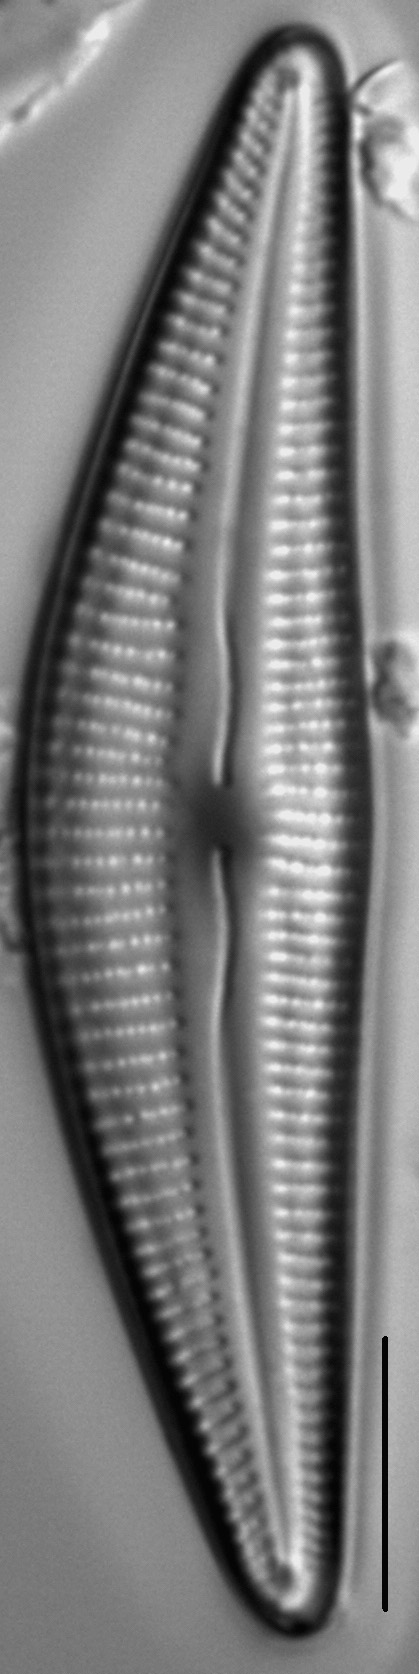 Cymbella Stigmaphora1